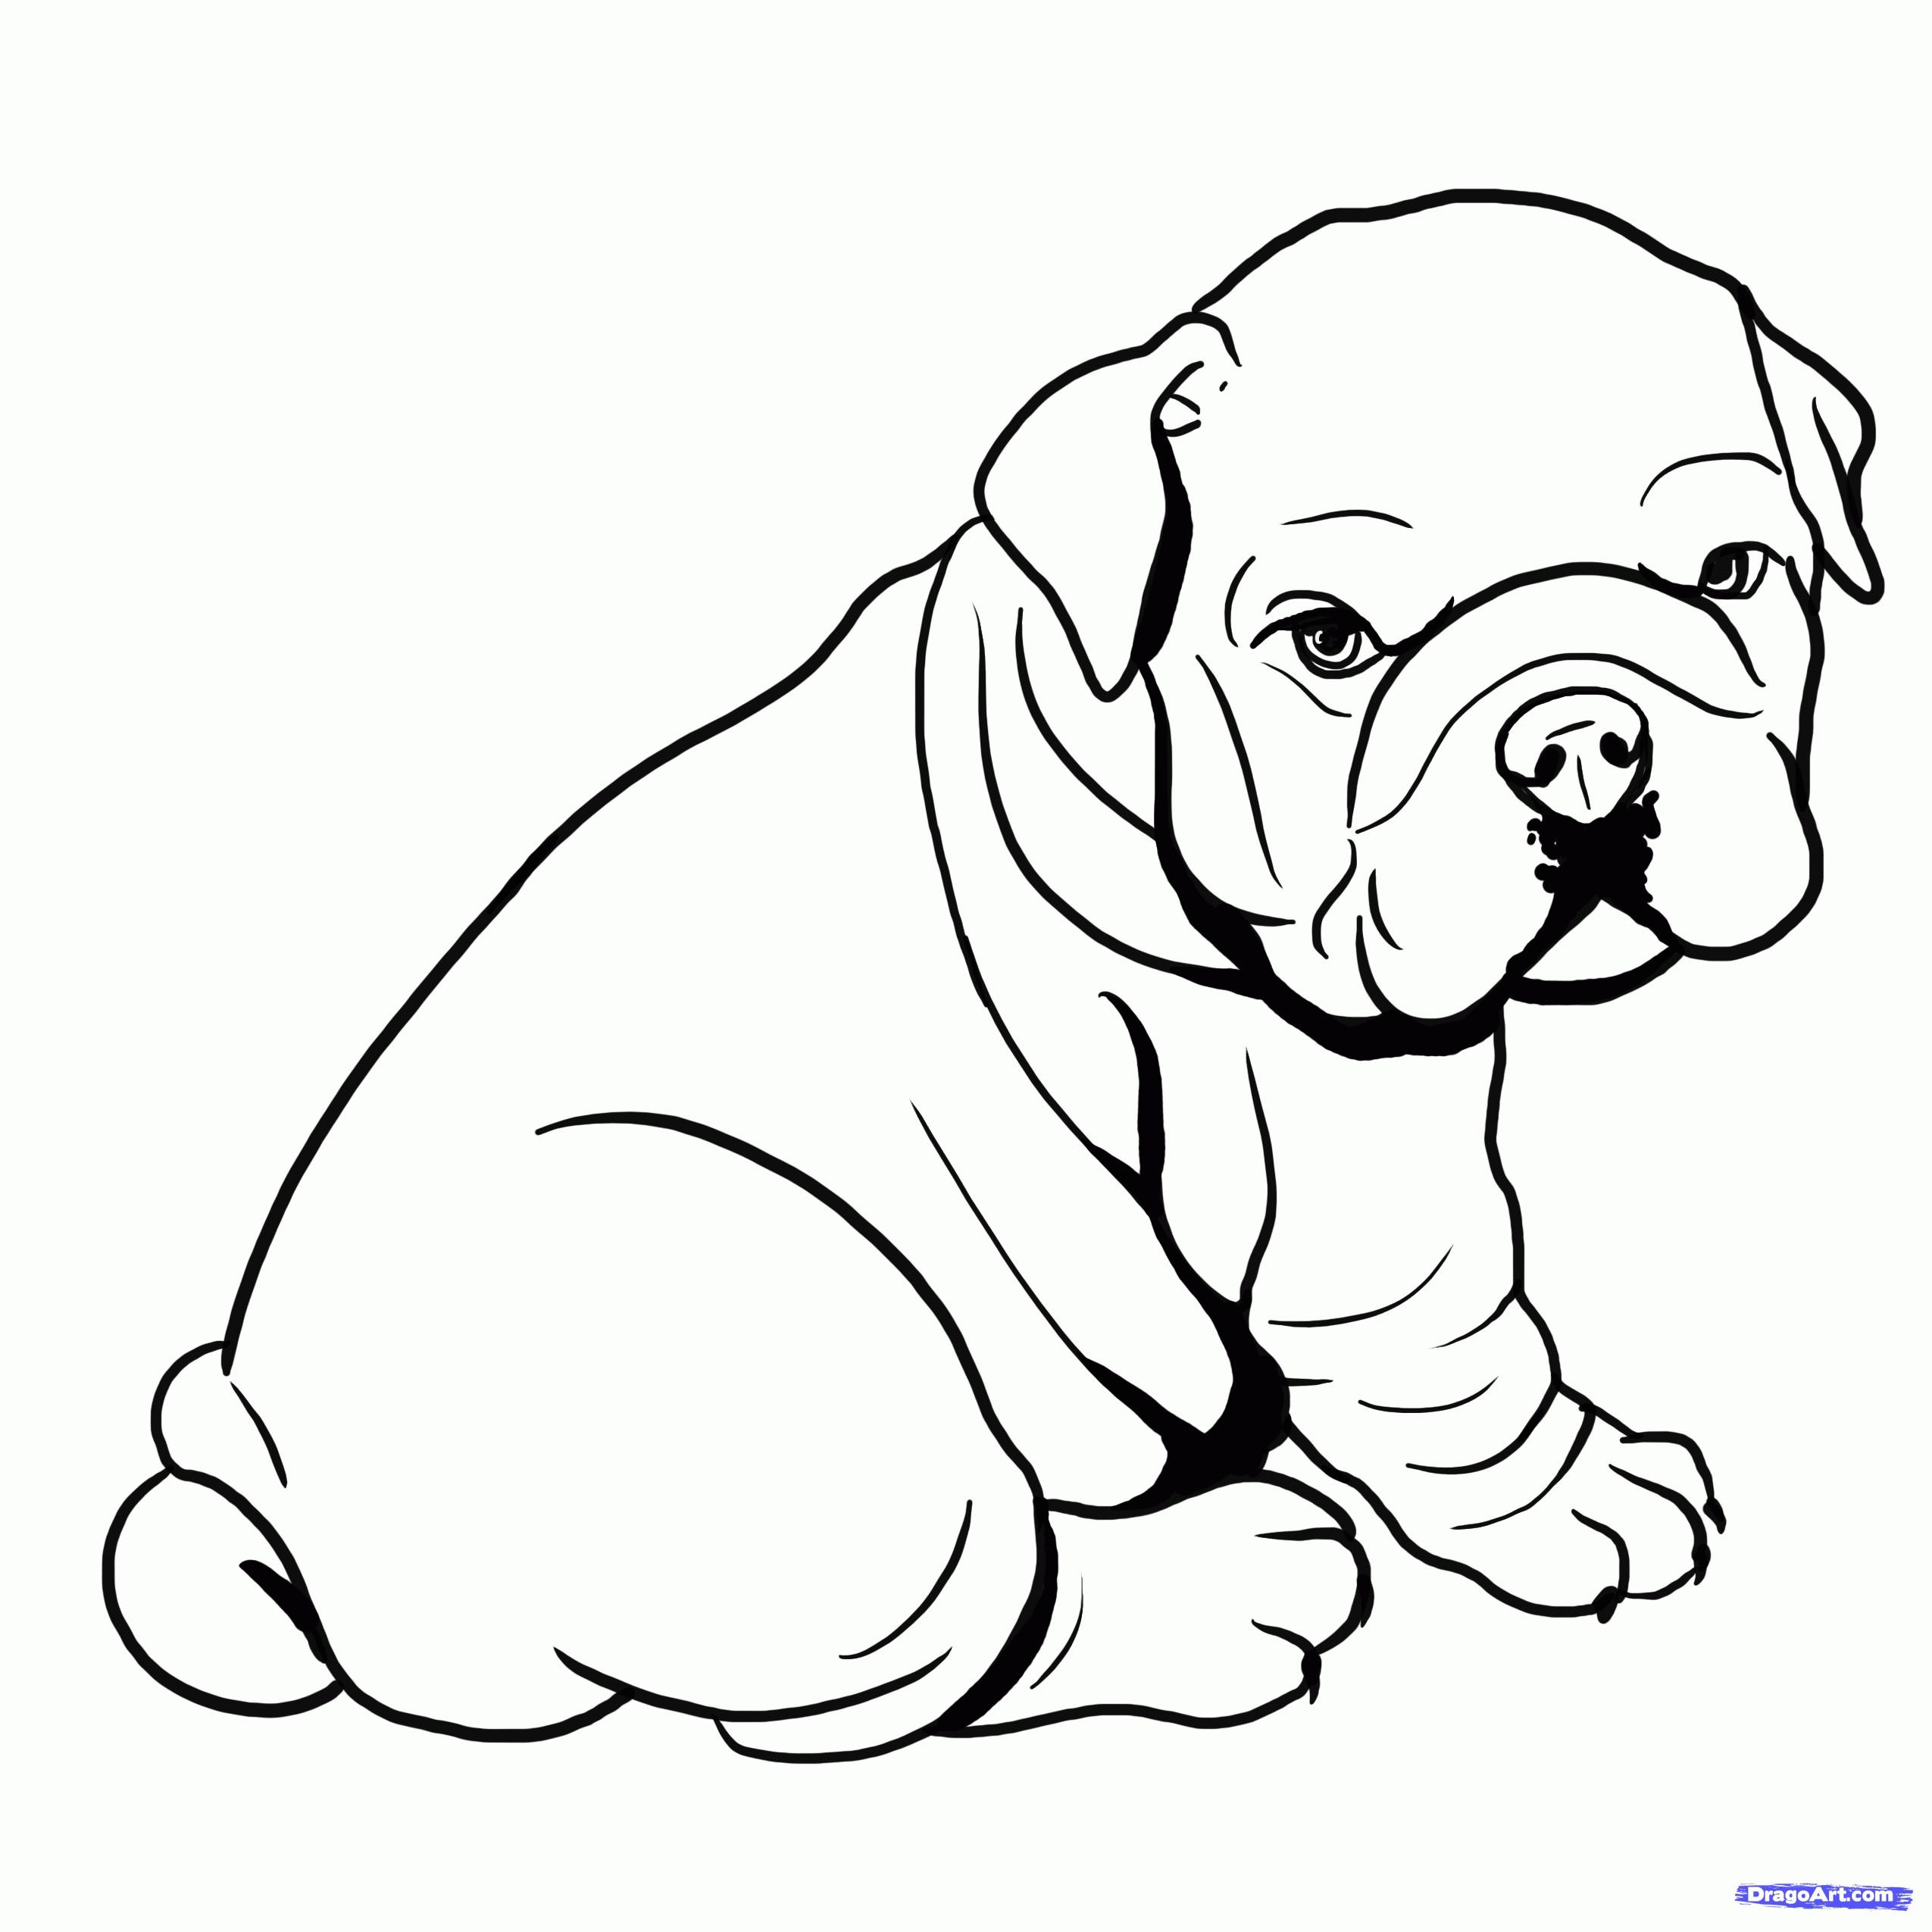 2550x2550 bulldog drawing valid how to draw a bulldog english bulldog step